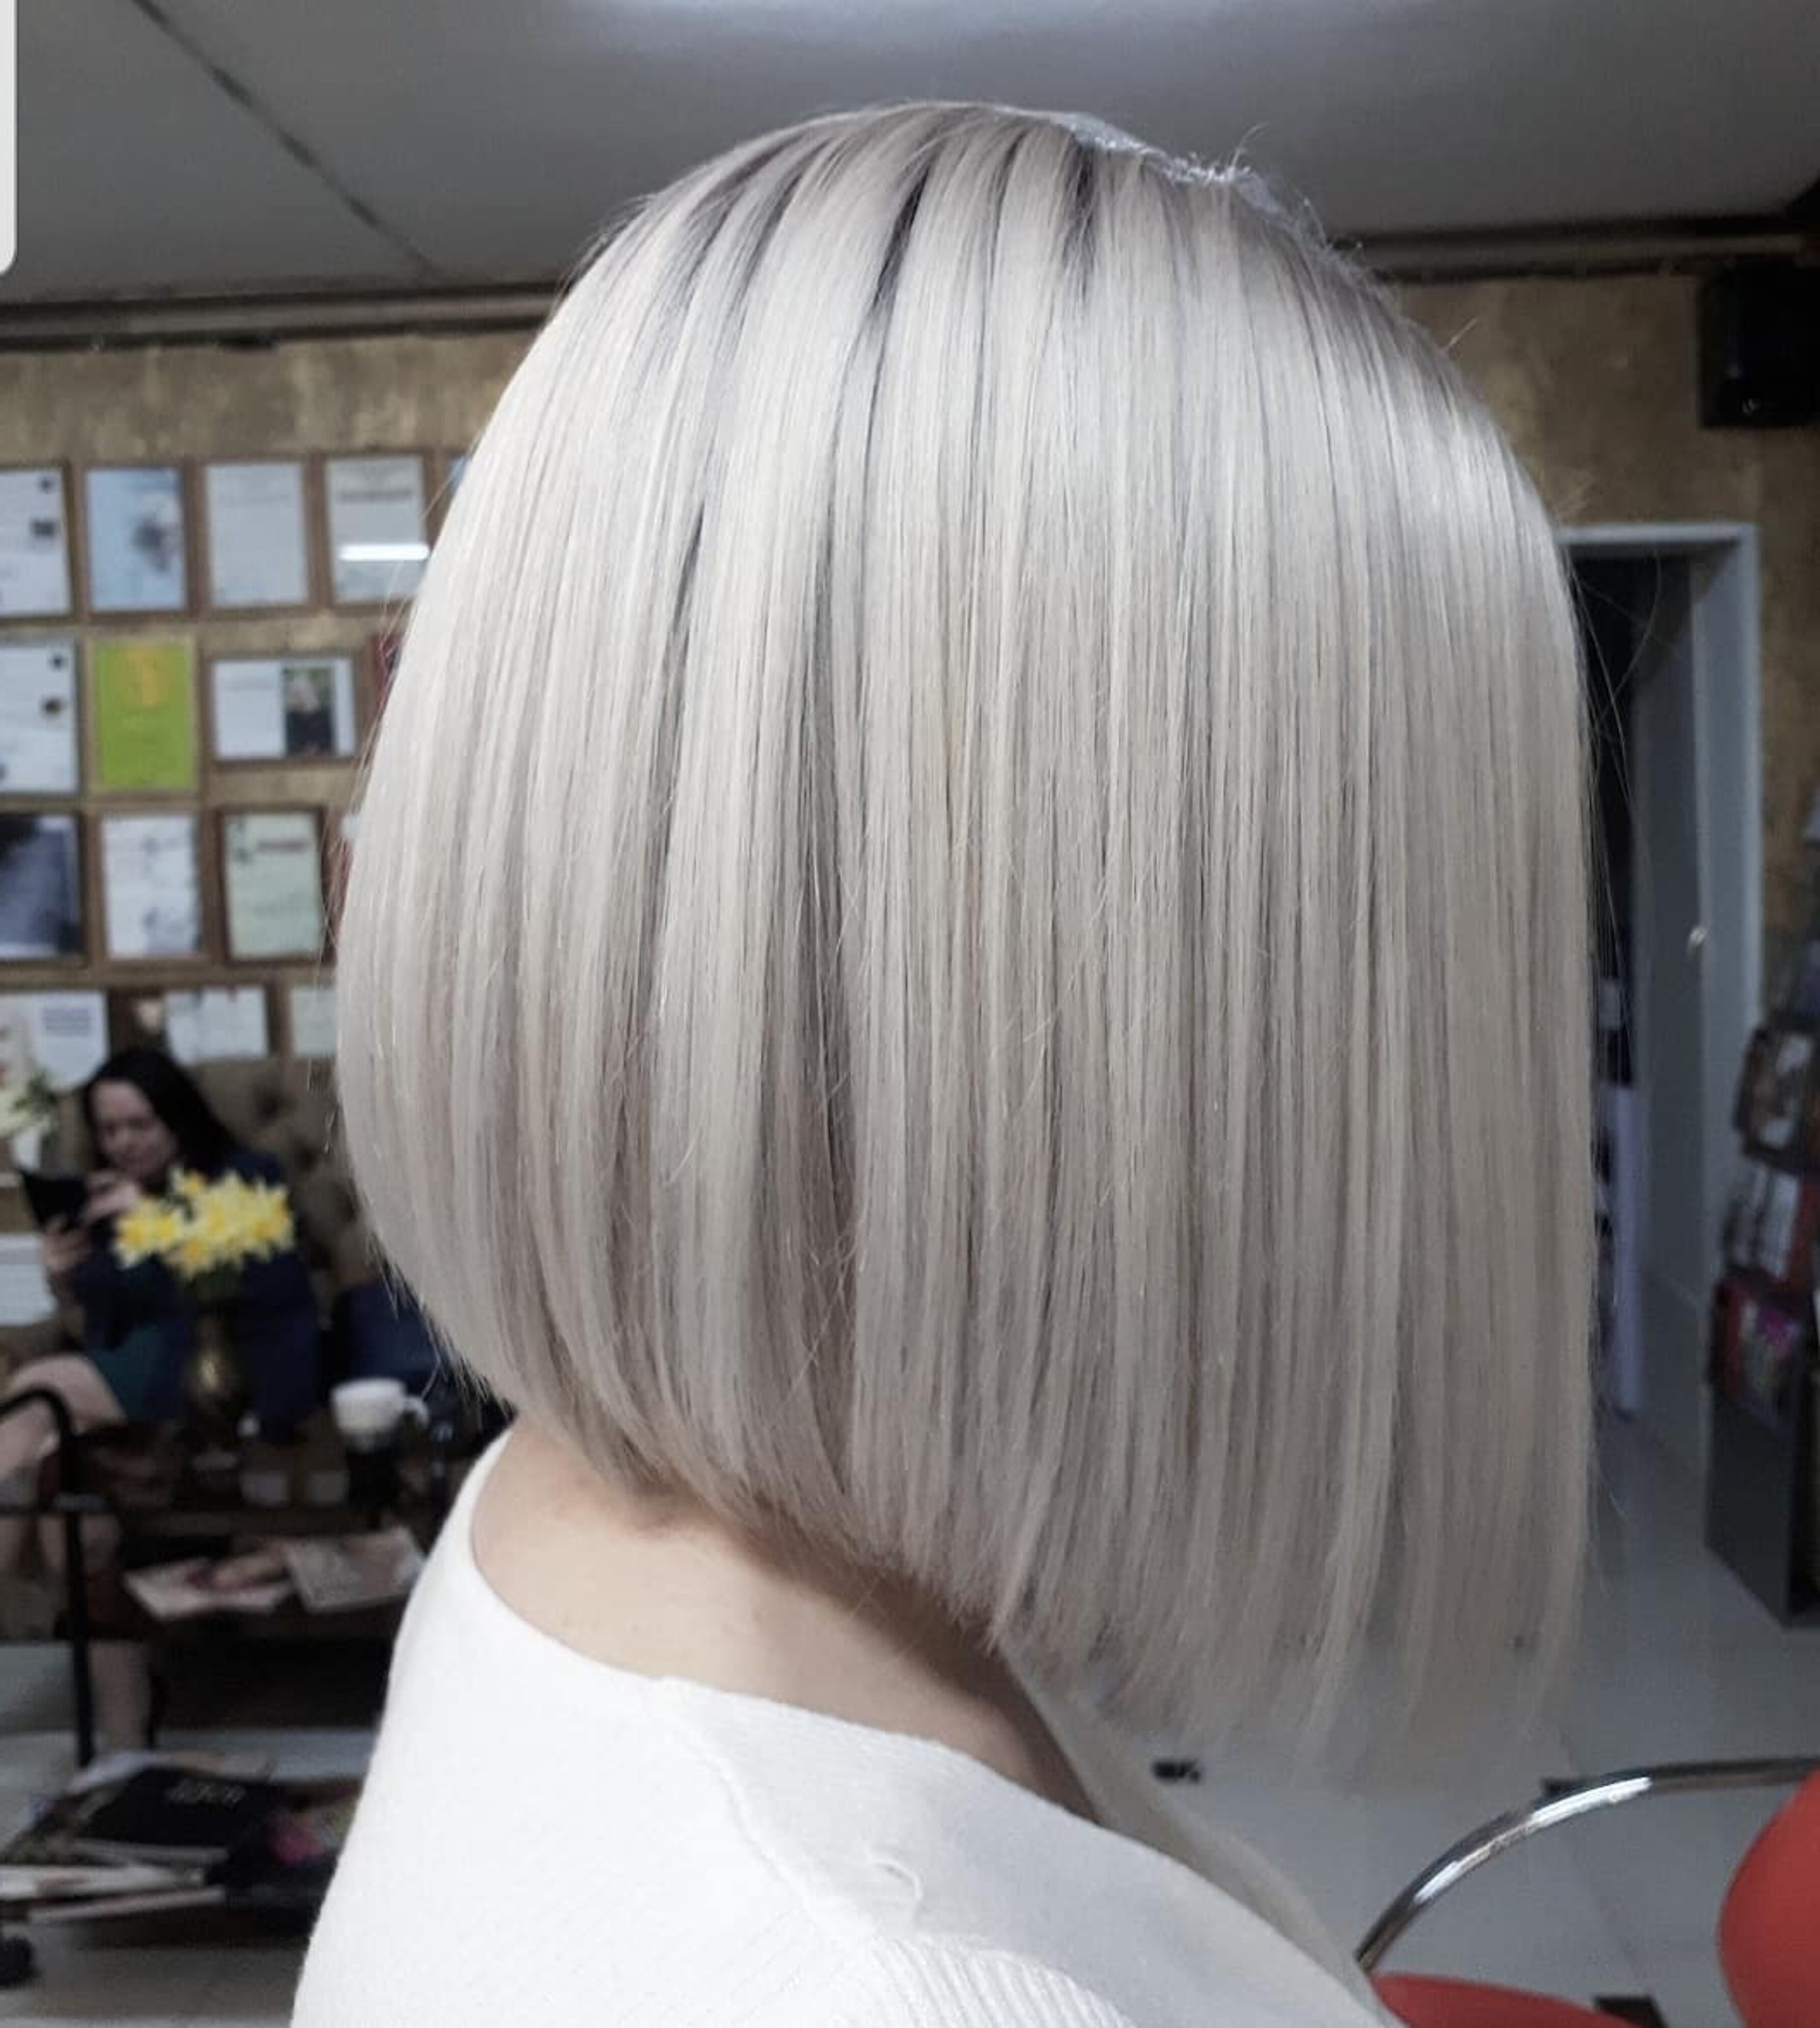 A metallic blonde bob haircut.